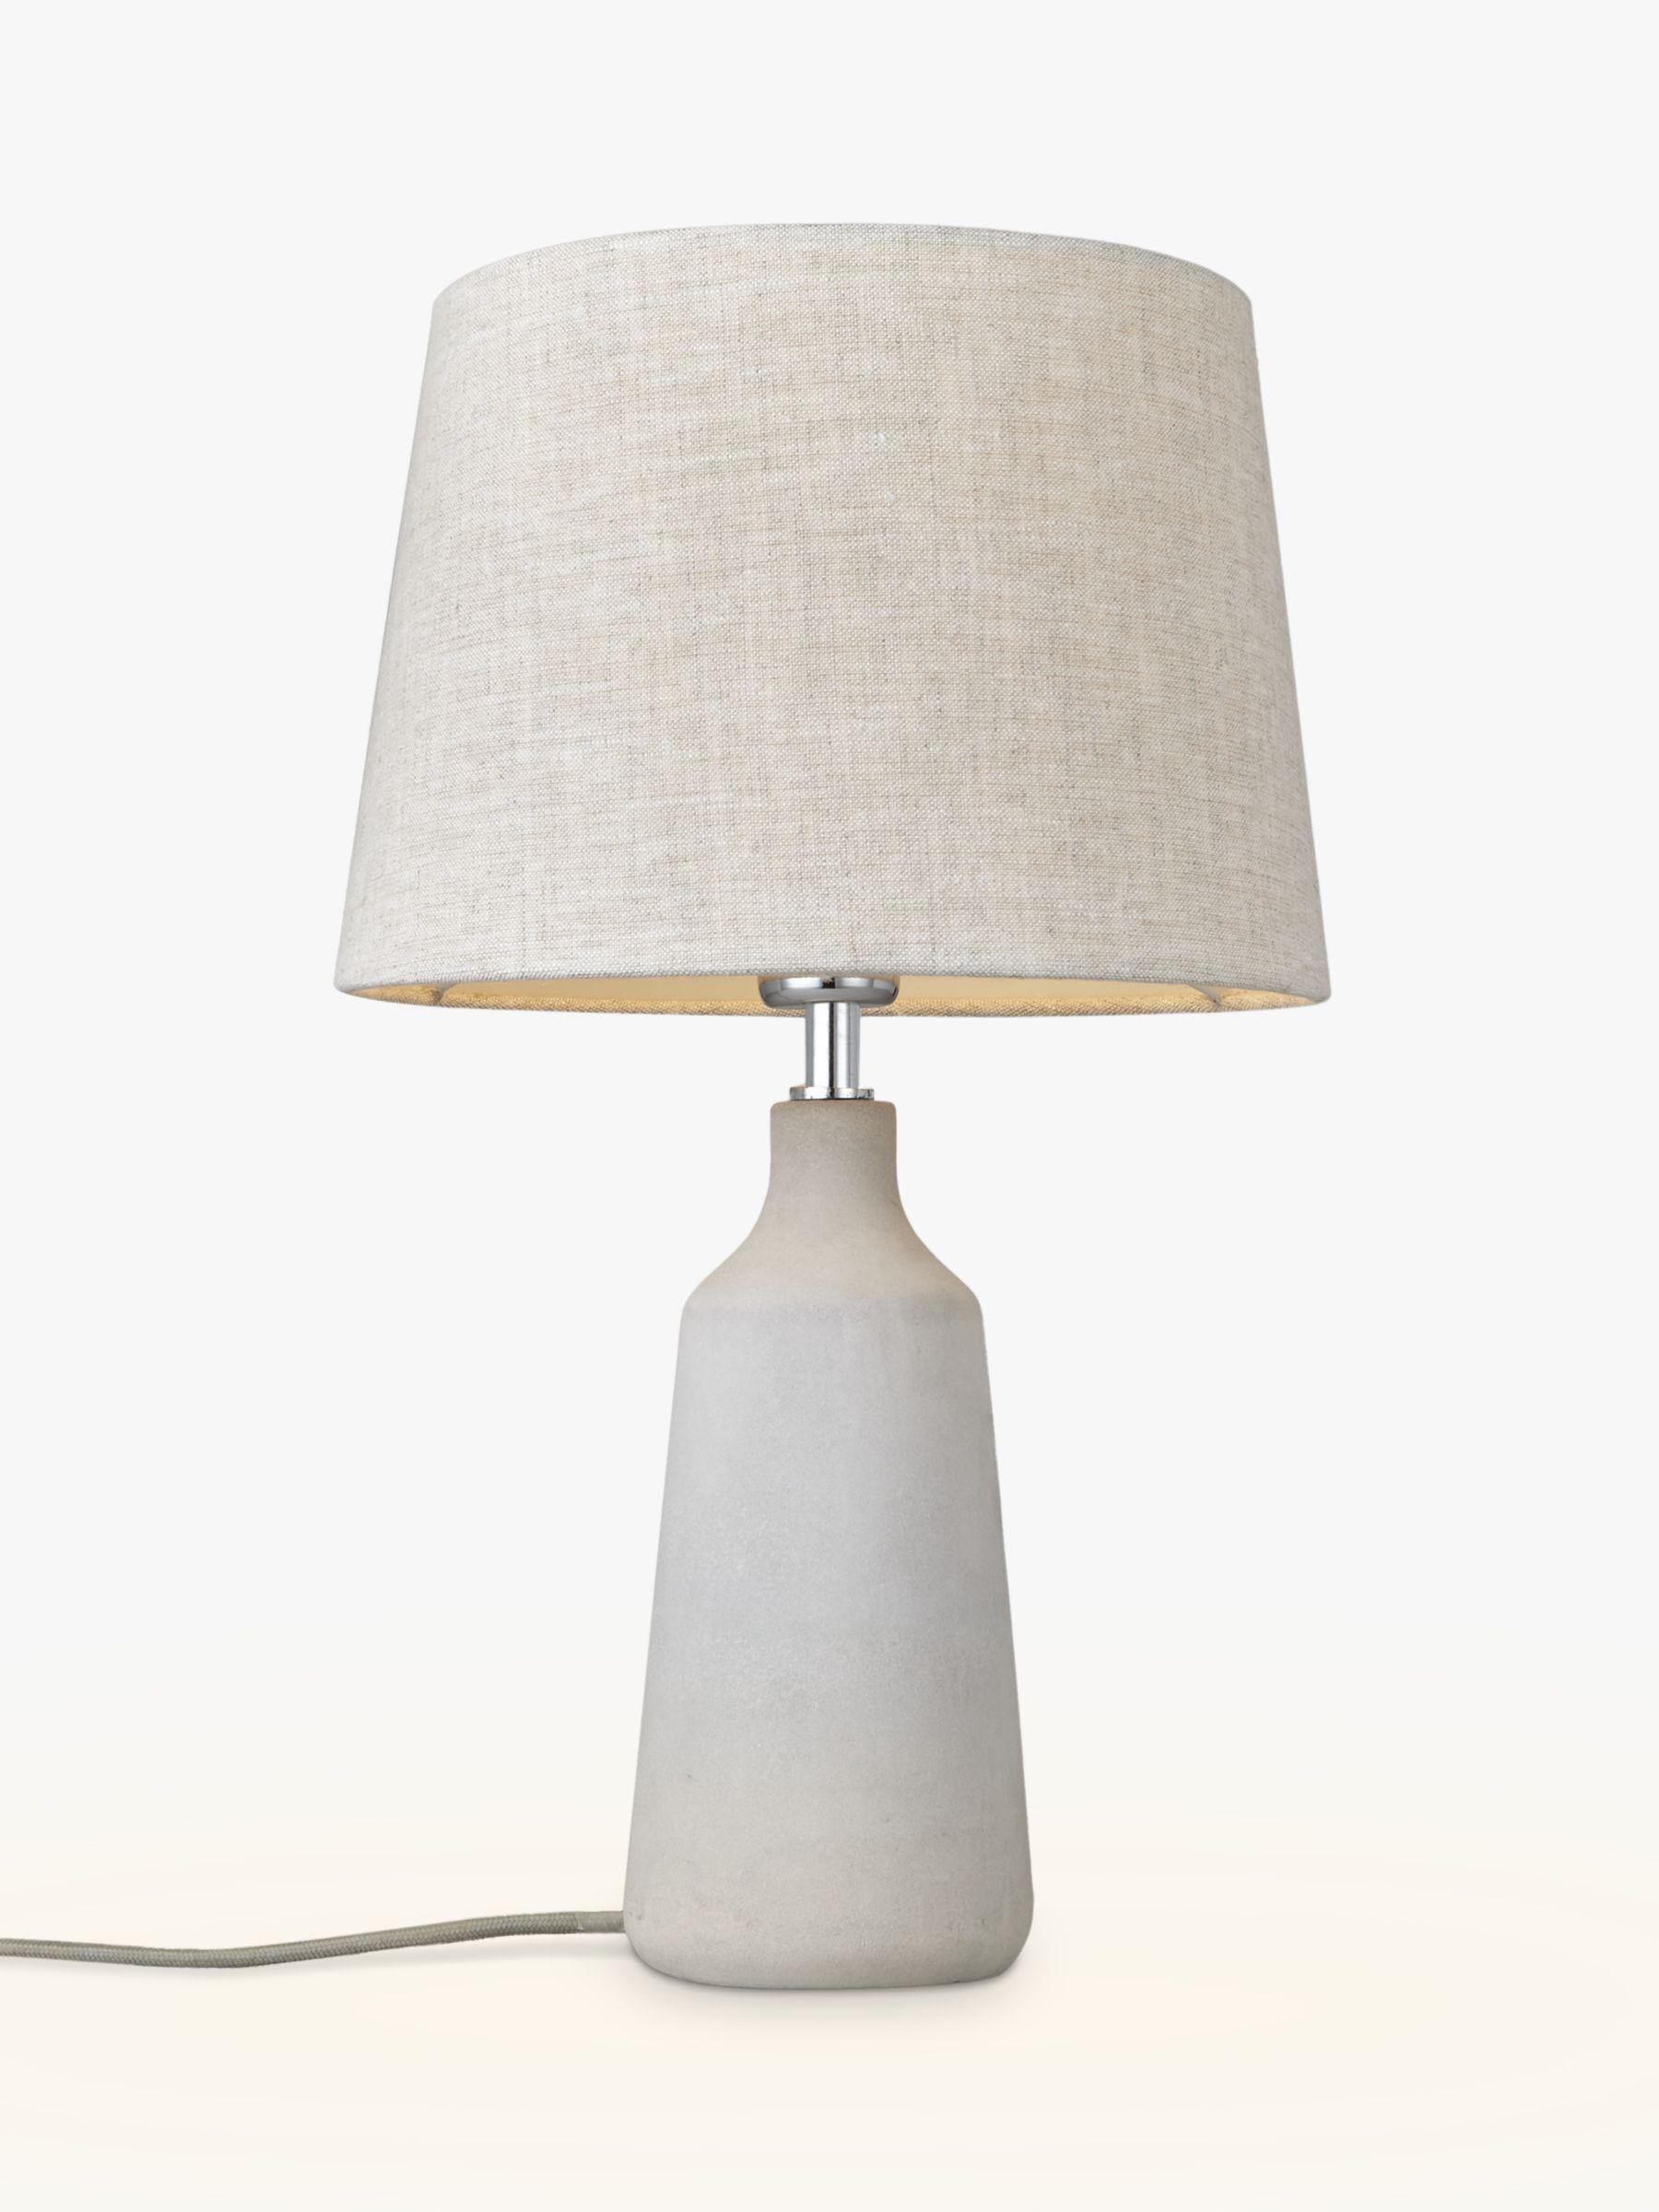 John Lewis & Partners Linney Concrete Table Lamp